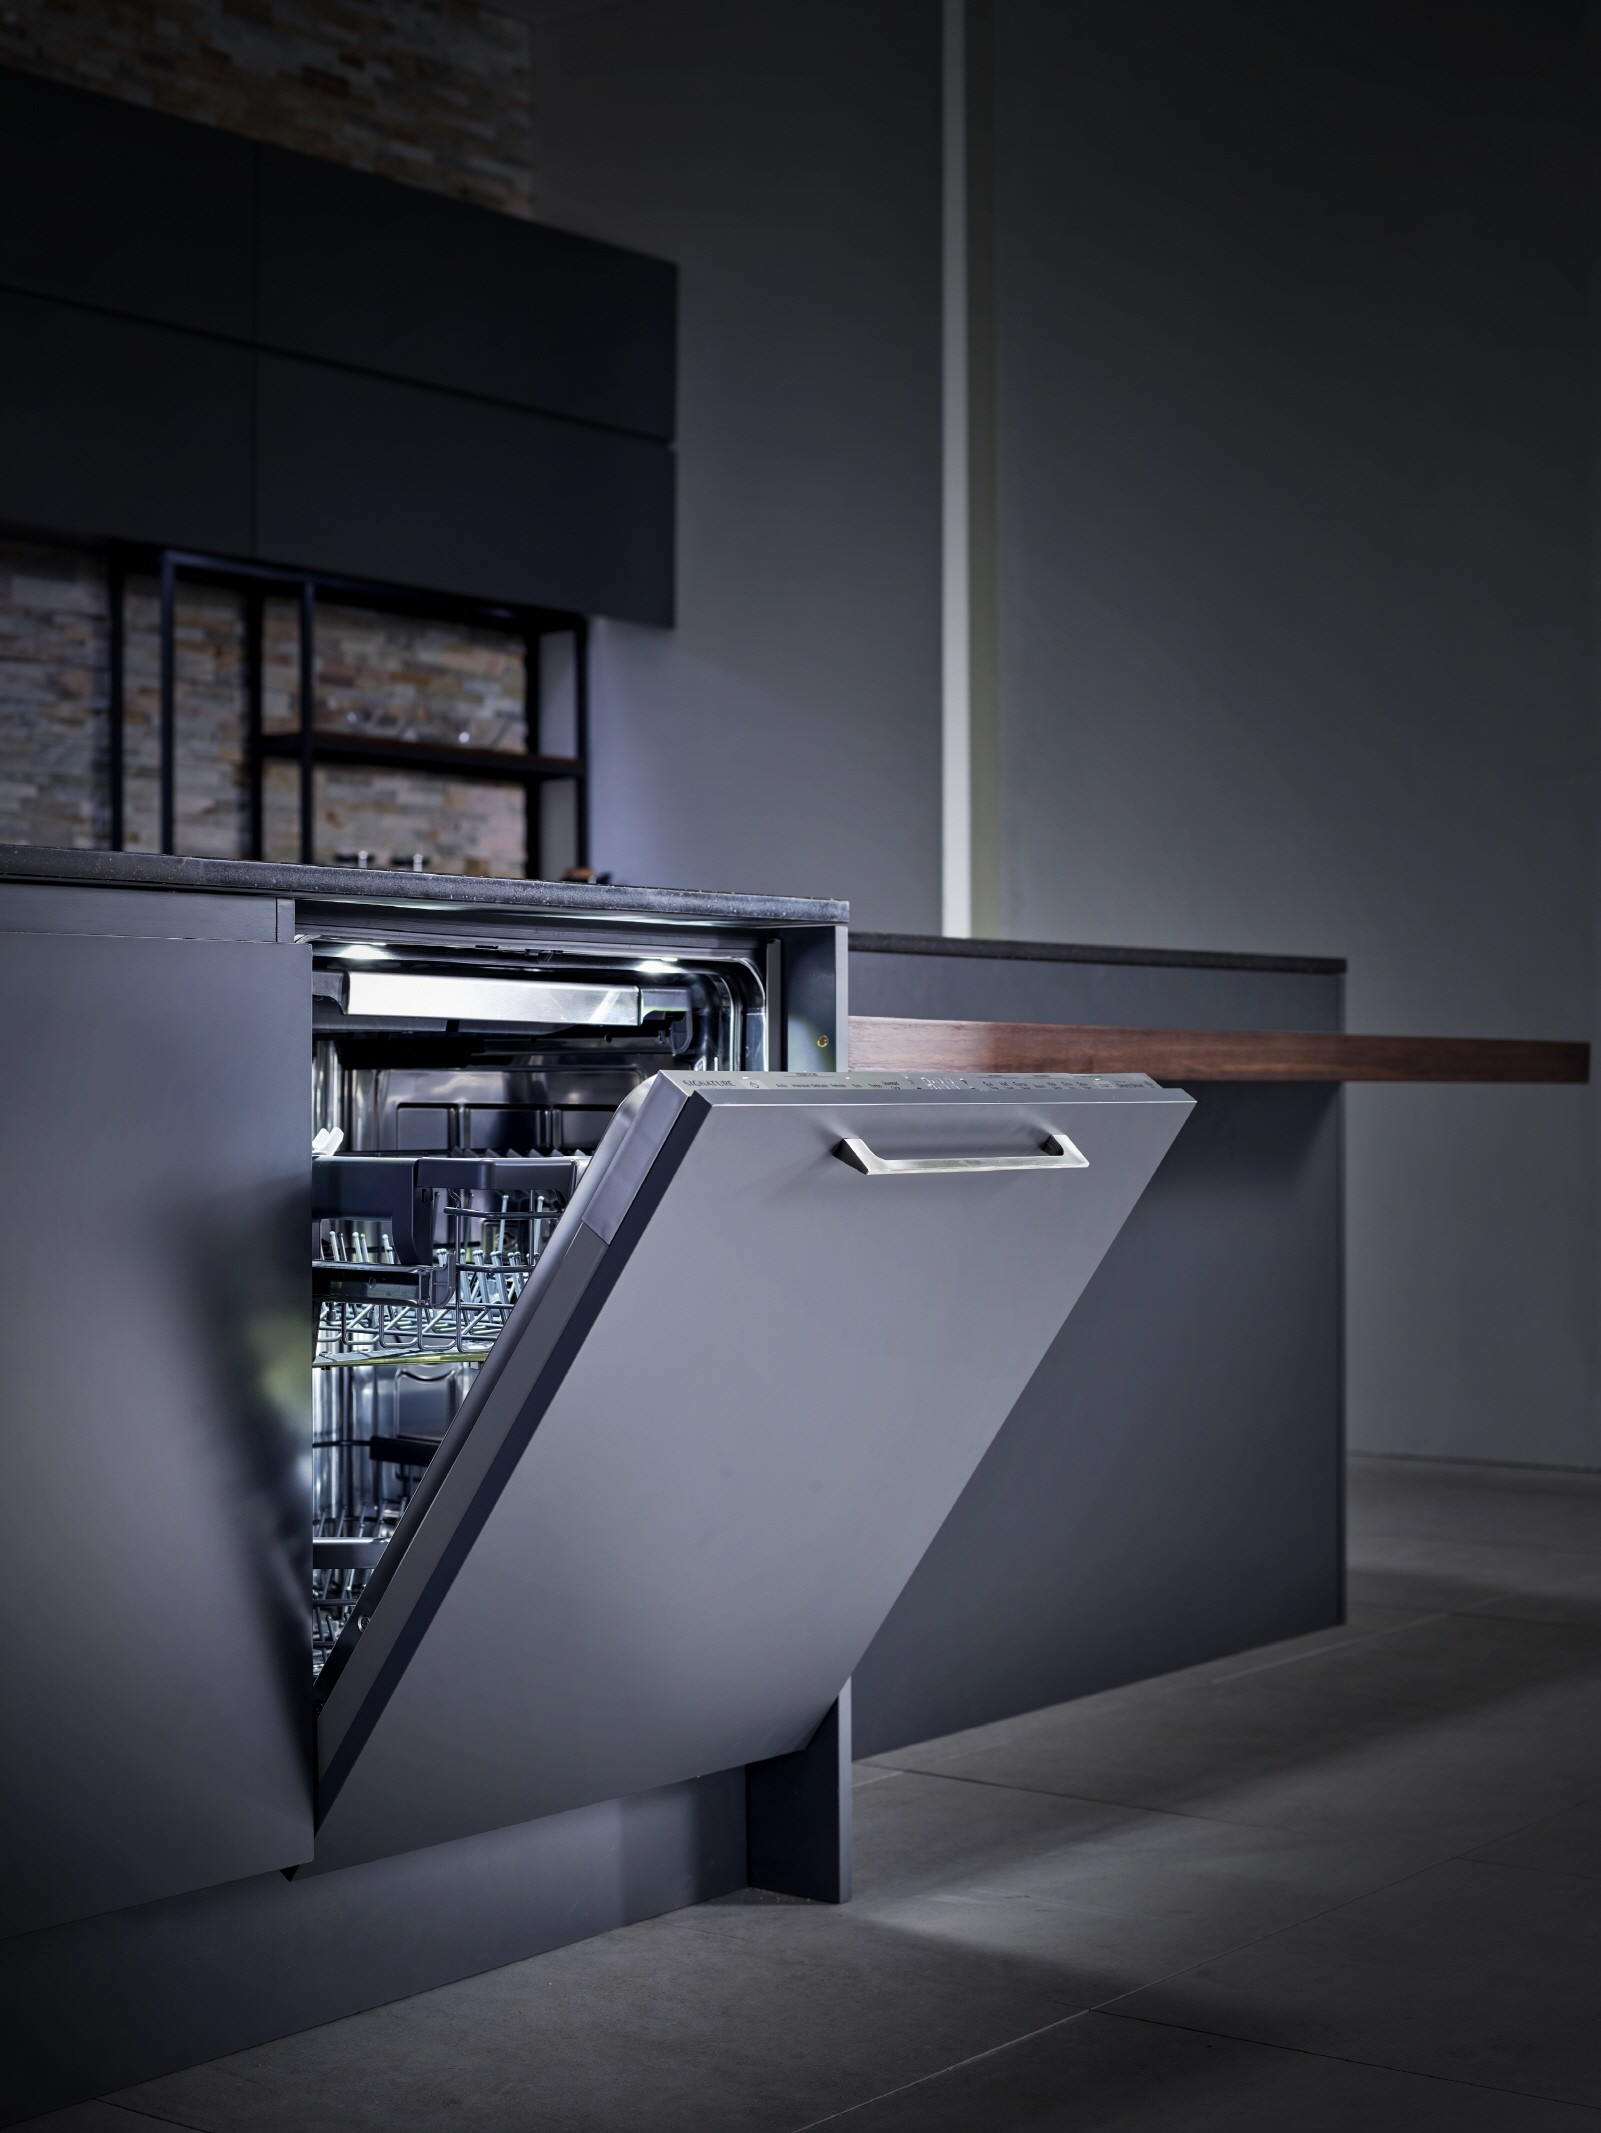 SIGNATURE KITCHEN SUITE dishwasher with slightly door open